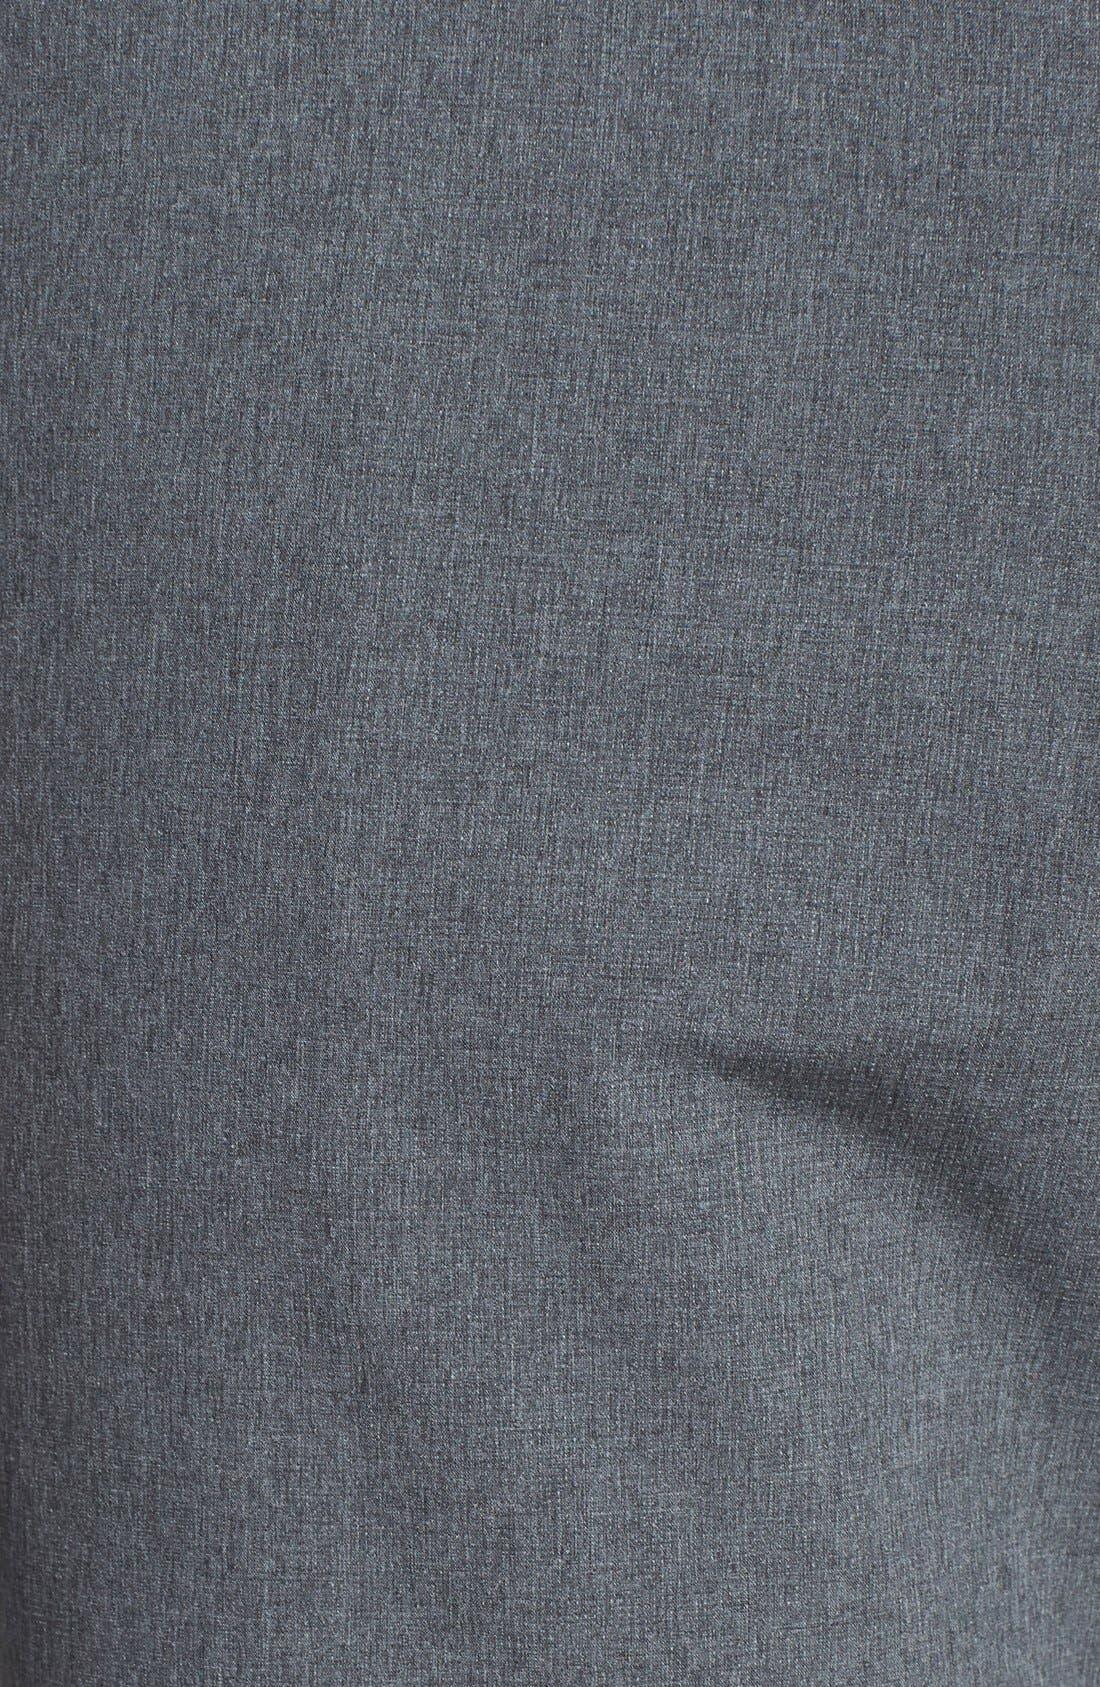 Alternate Image 3  - Cutter & Buck Bainbridge DryTec Flat Front Shorts